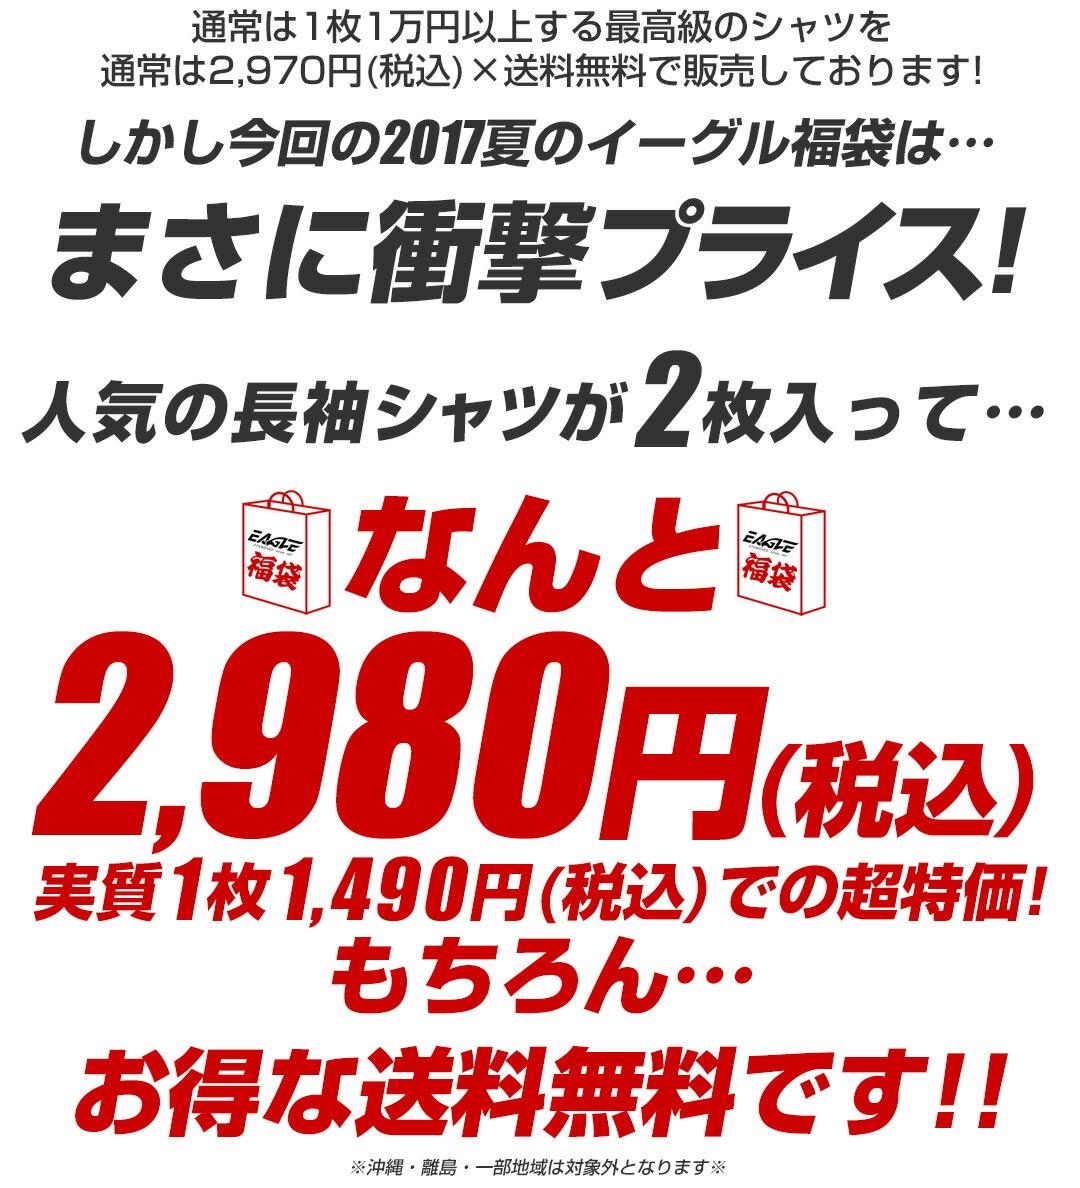 lss_e-fuku-copy2_02a.jpg